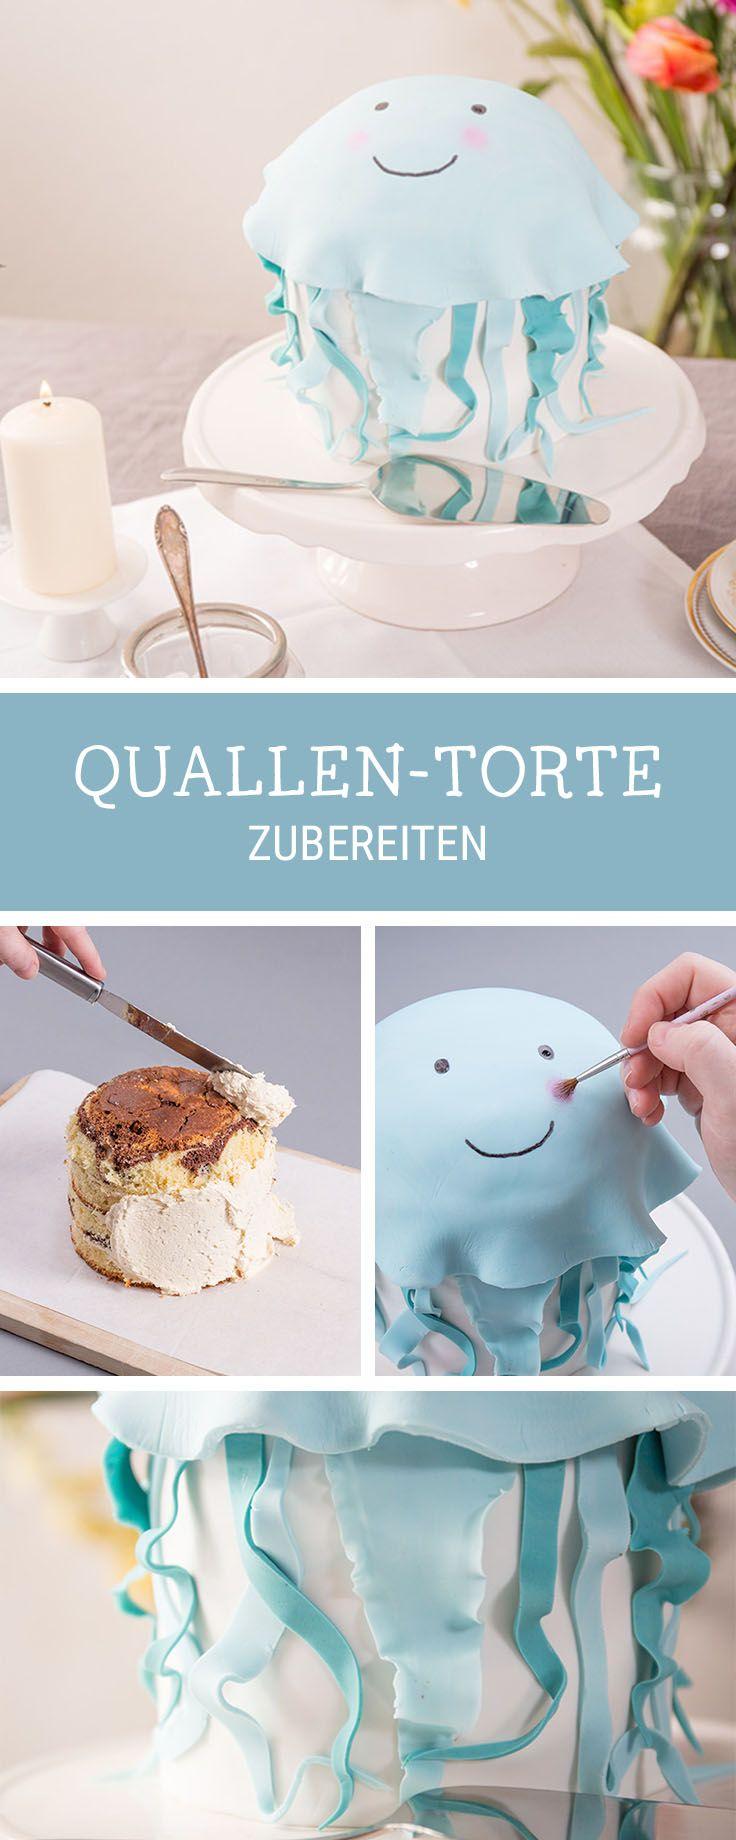 Motivtorte selberbacken: Witzige Quallentorte zum Geburtstag / funny cake inspiration: turn your birthday cake into a jellyfish cake via DaWanda.com